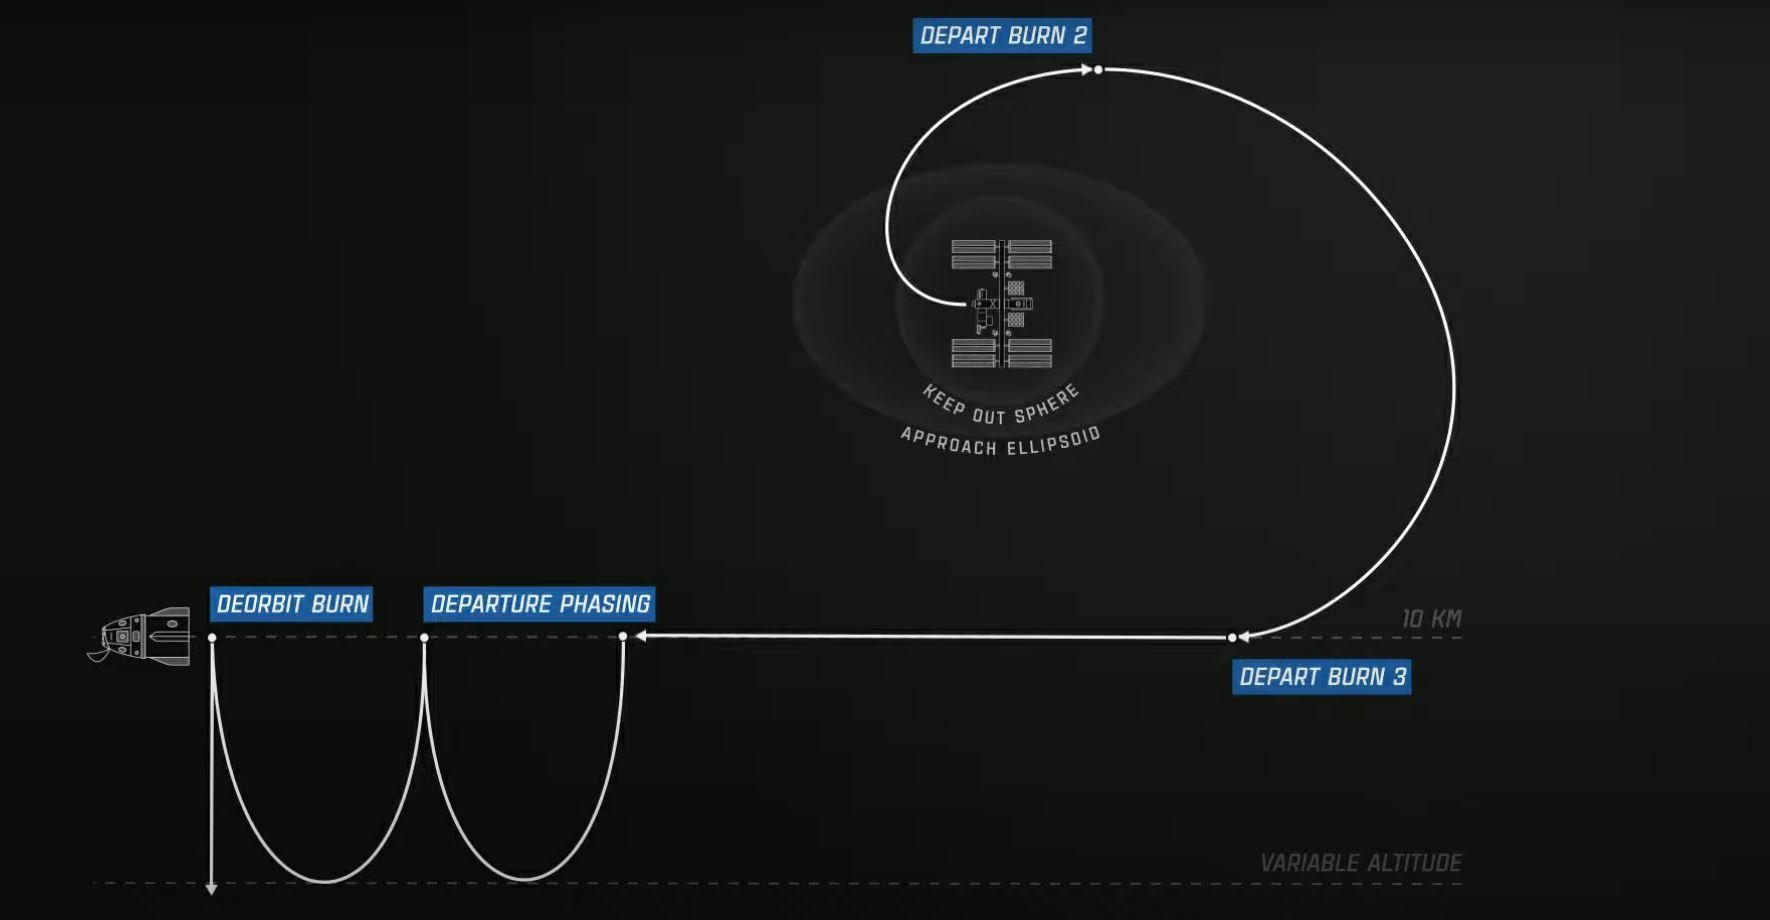 SpaceX Crew Dragon Departure Burns